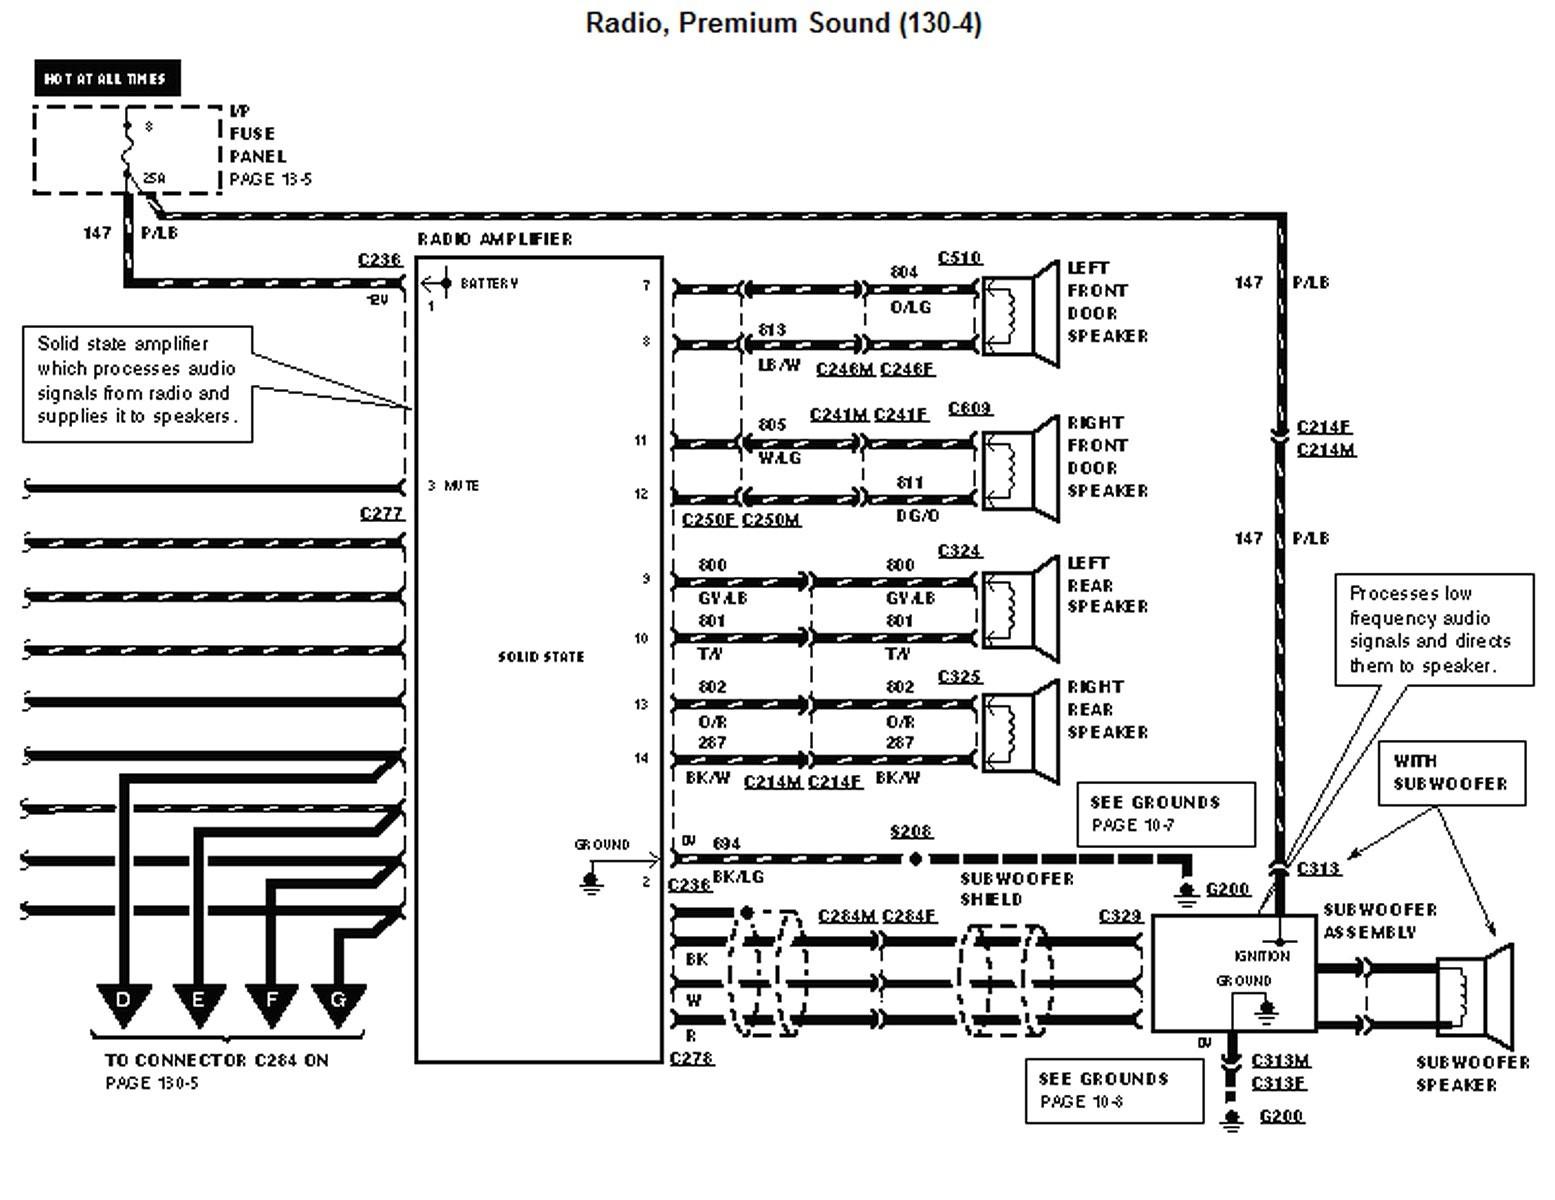 ZK_8845] 2002 F250 Super Duty Radio Wiring Harness Download Diagram | 2002 F250 Radio Wiring |  | Over Arch Erek Loskopri Oliti Hemt Onica Stic Over Ostr Bios Hendil  Mohammedshrine Librar Wiring 101